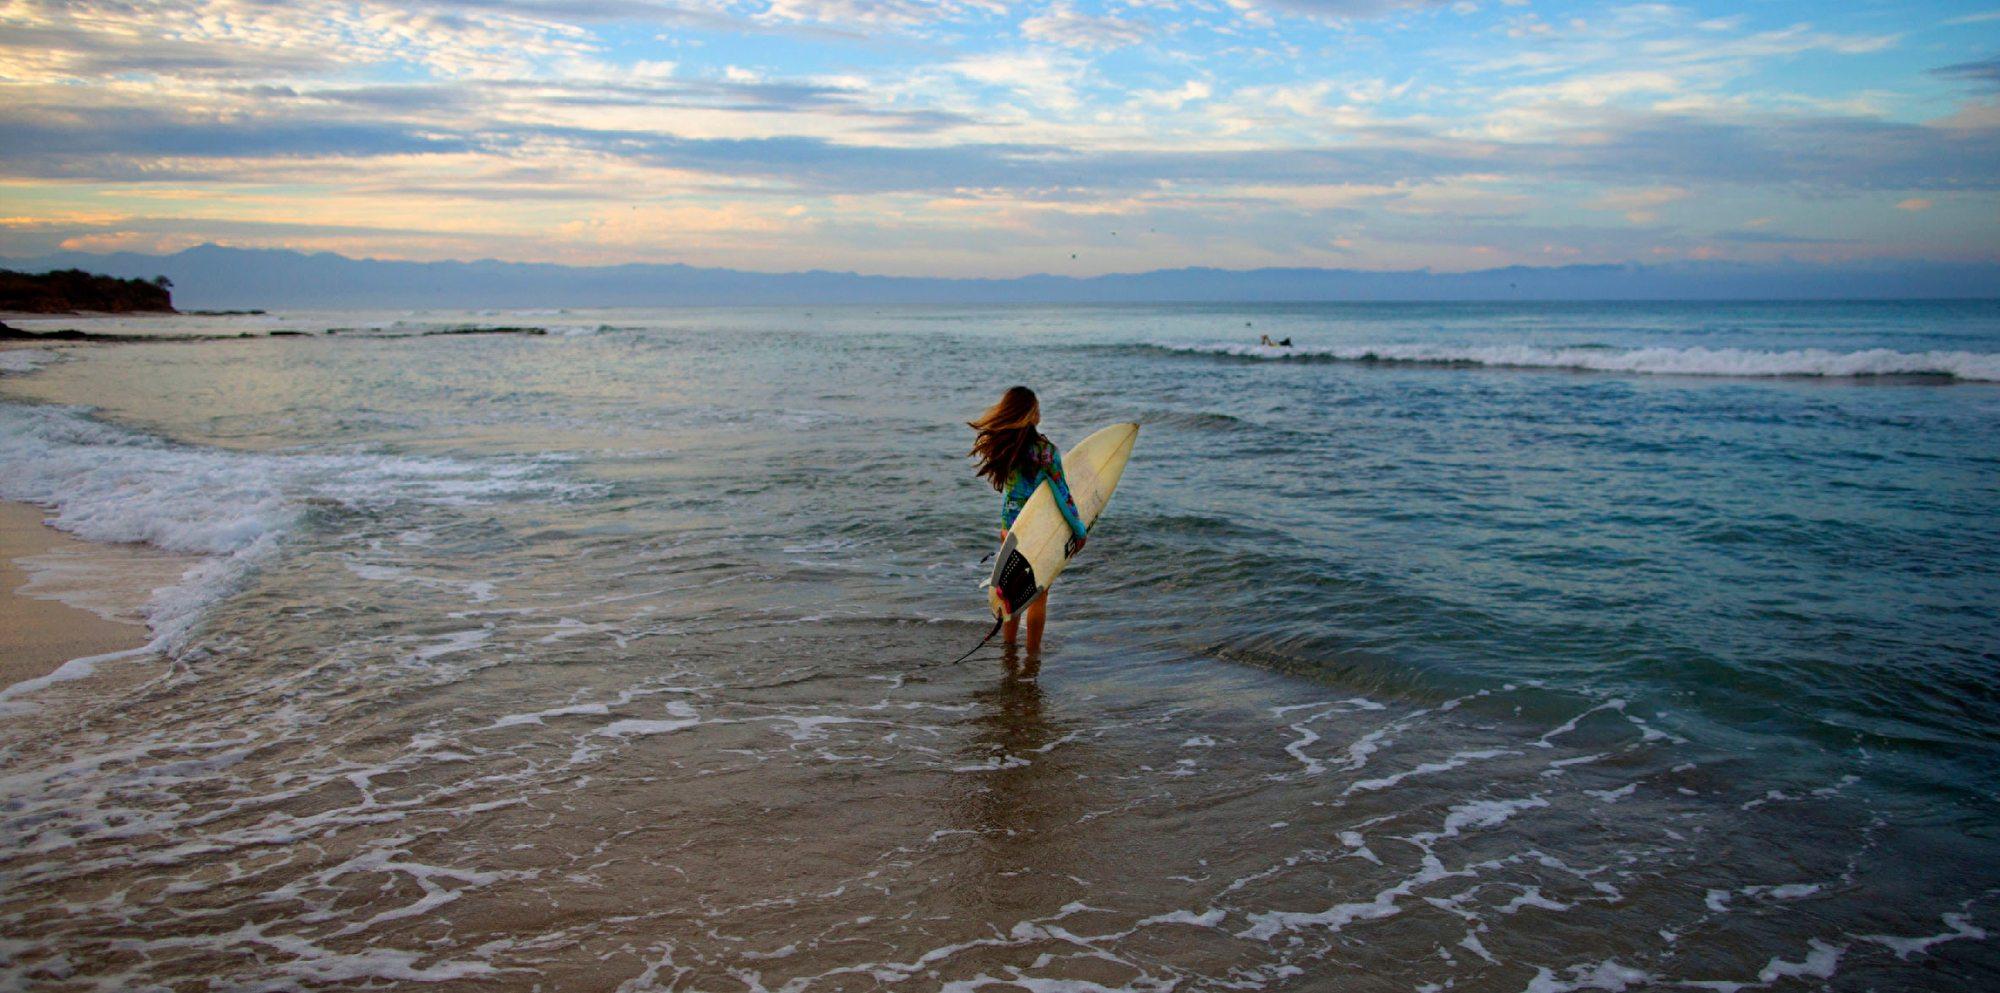 Female surfer in Punta Mita